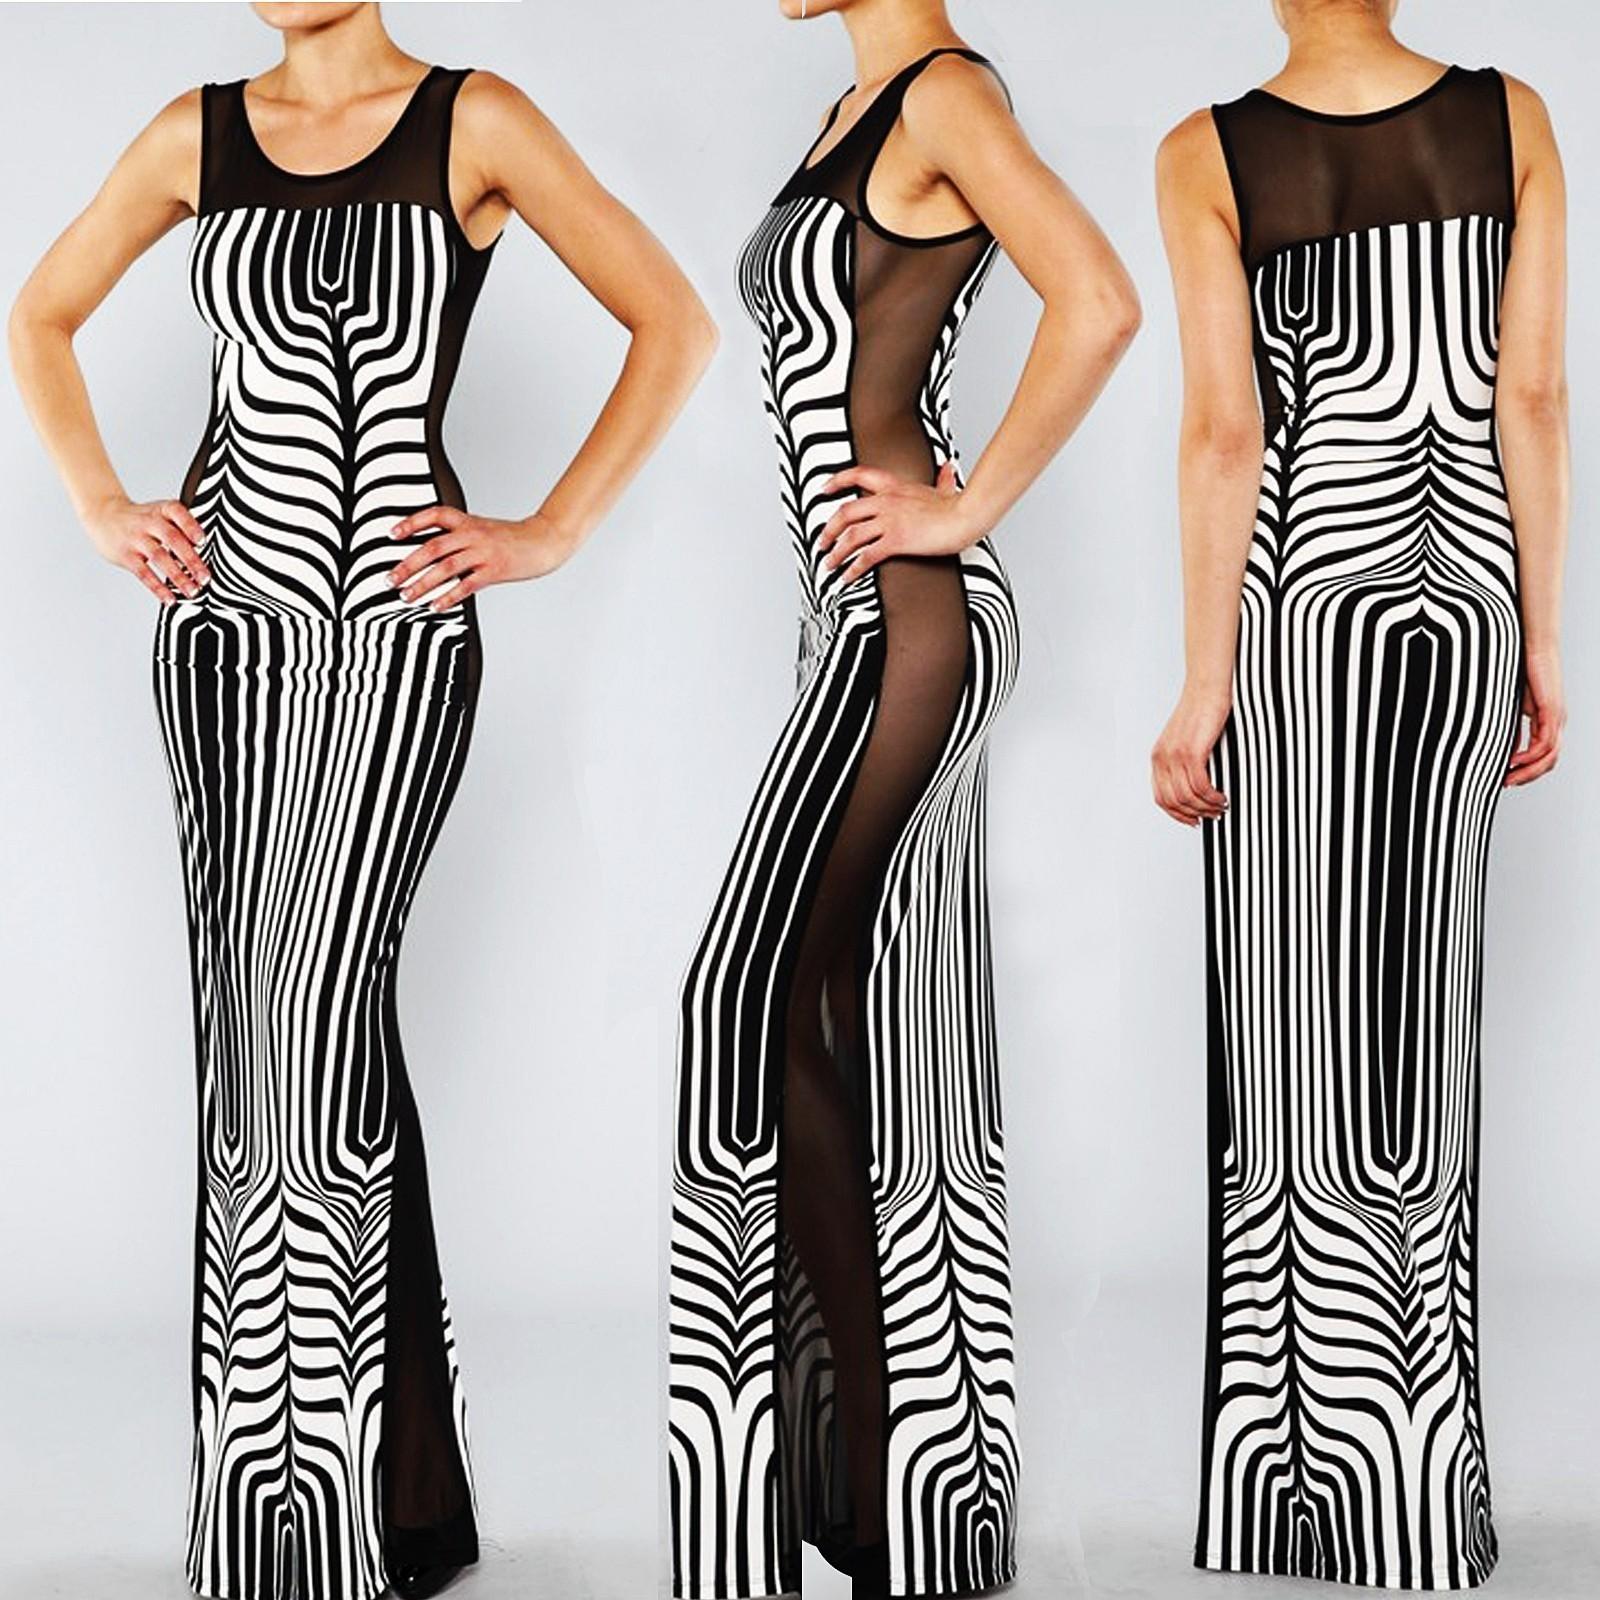 EXOTIC CHEVRON ZEBRA Art Print Sheer MESH Black White Sexy BodyCon Maxi Dress L - Dresses